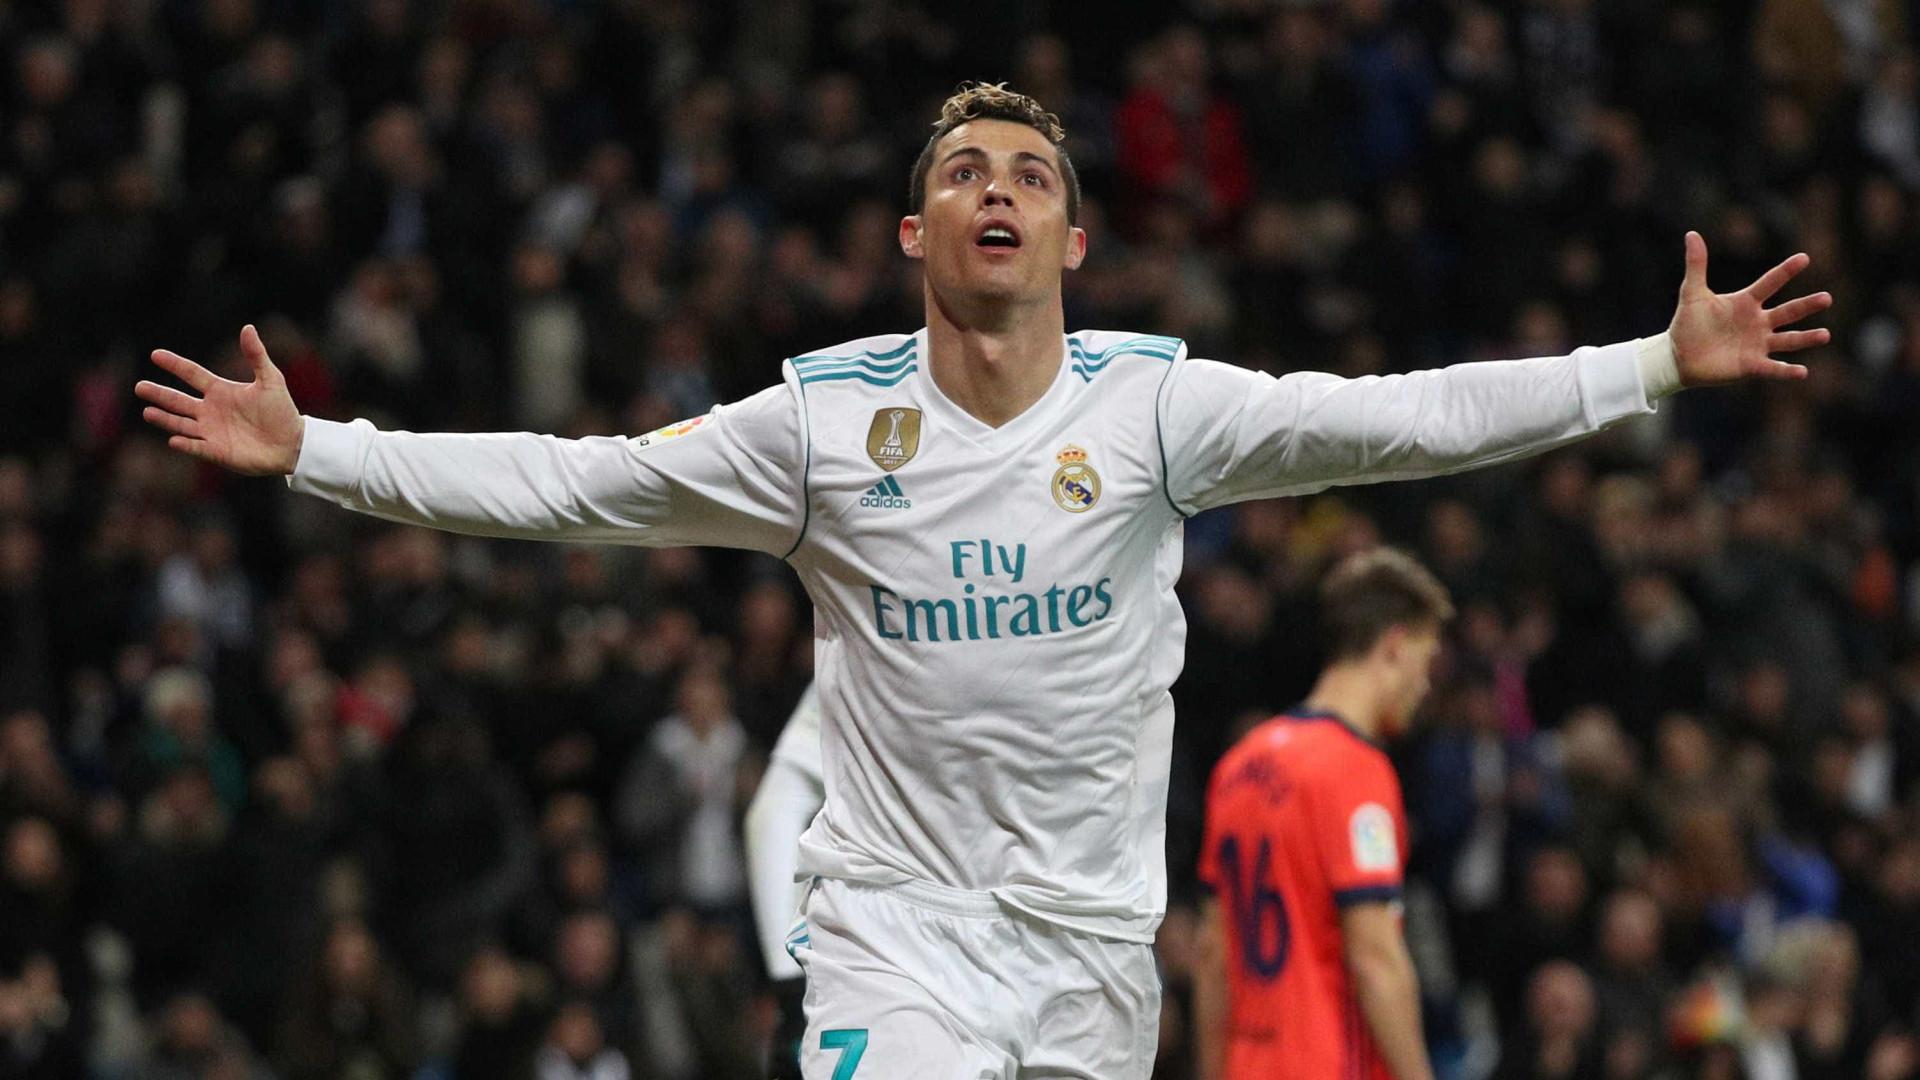 Santiago Bernabéu ferve com Real Madrid-PSG